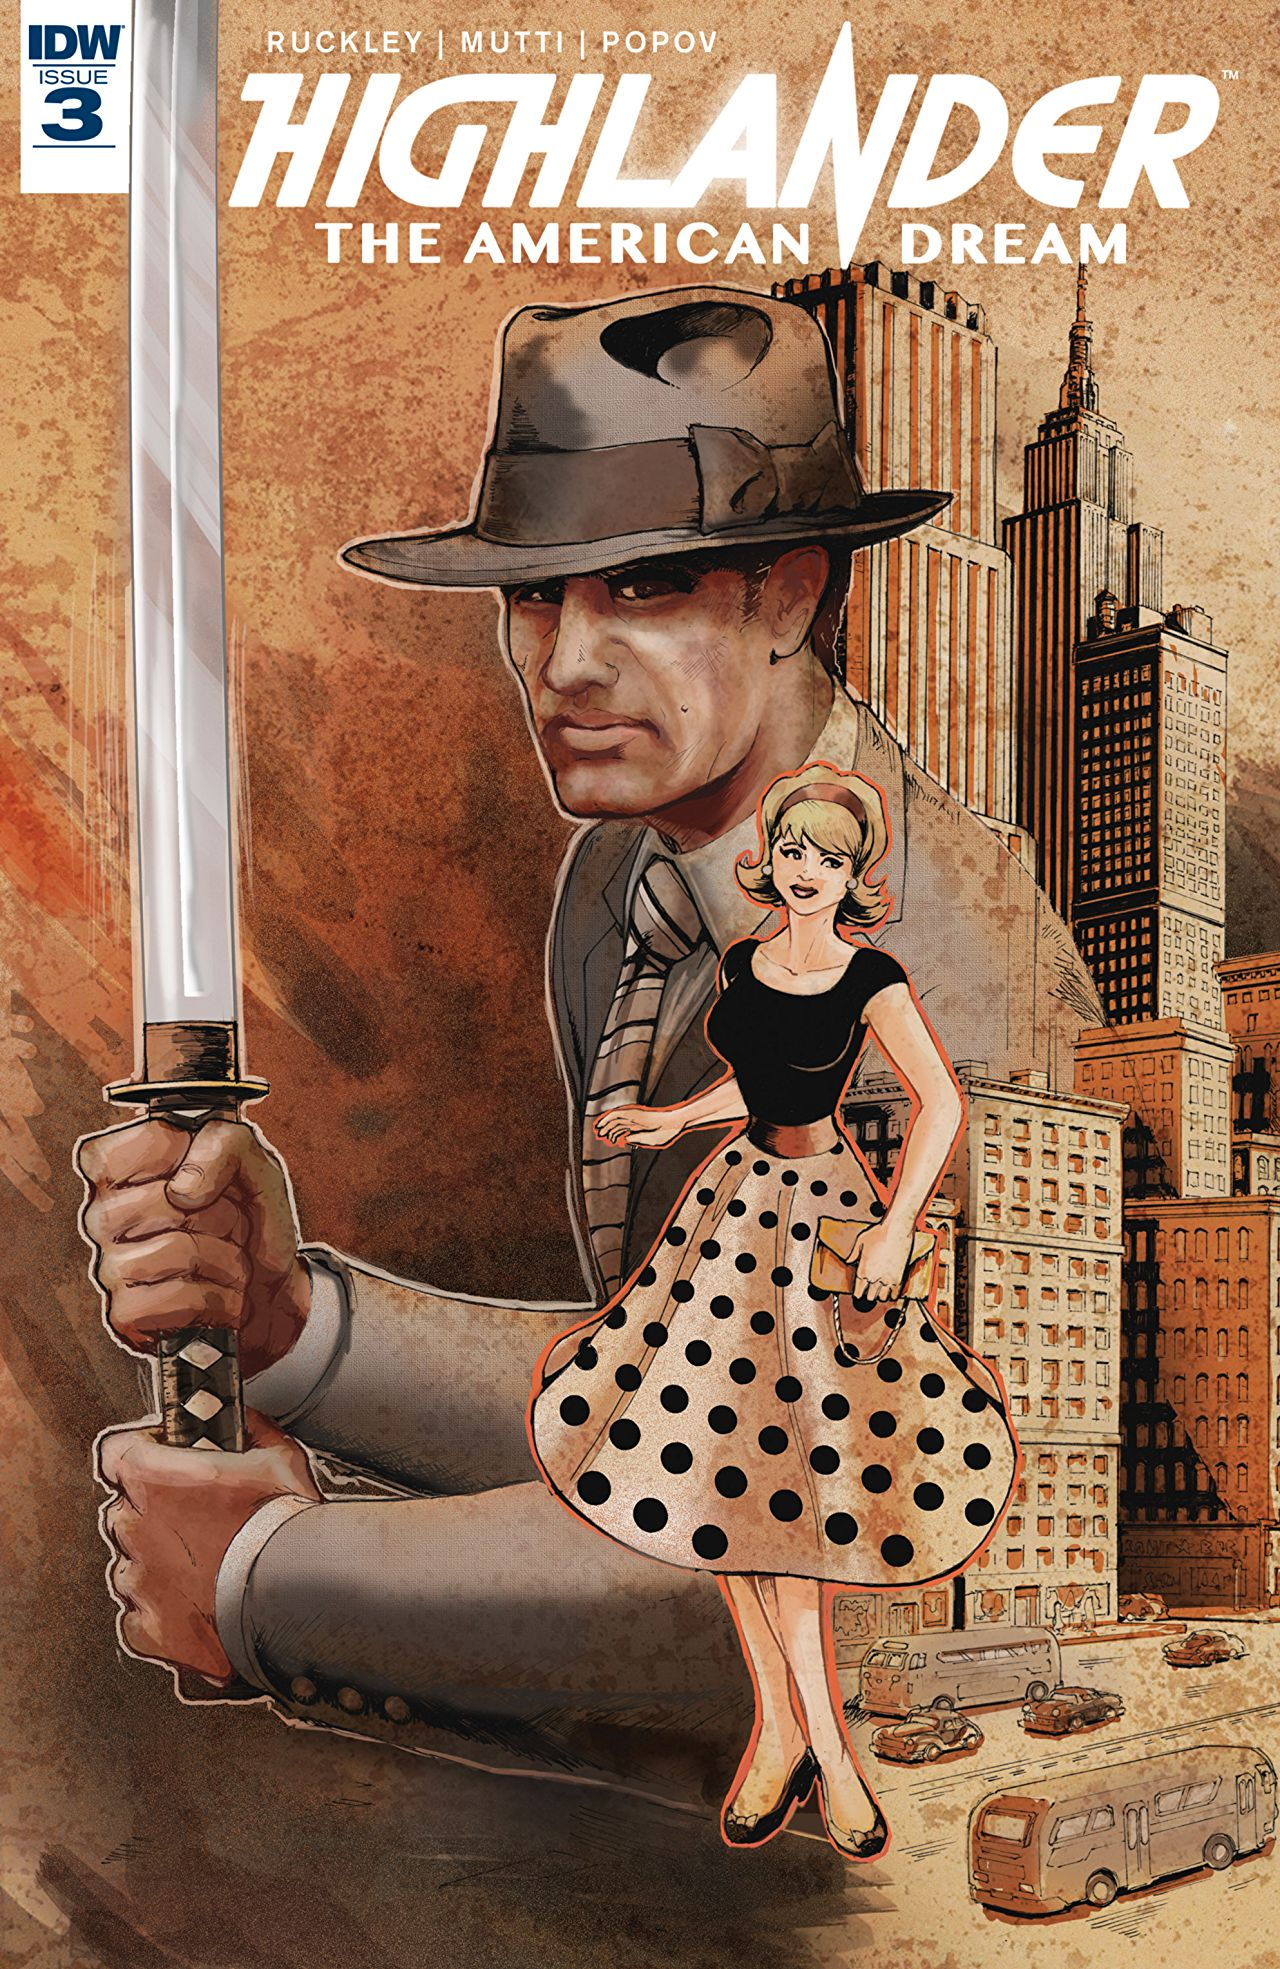 'Highlander: The American Dream' is a faithful companion to the film